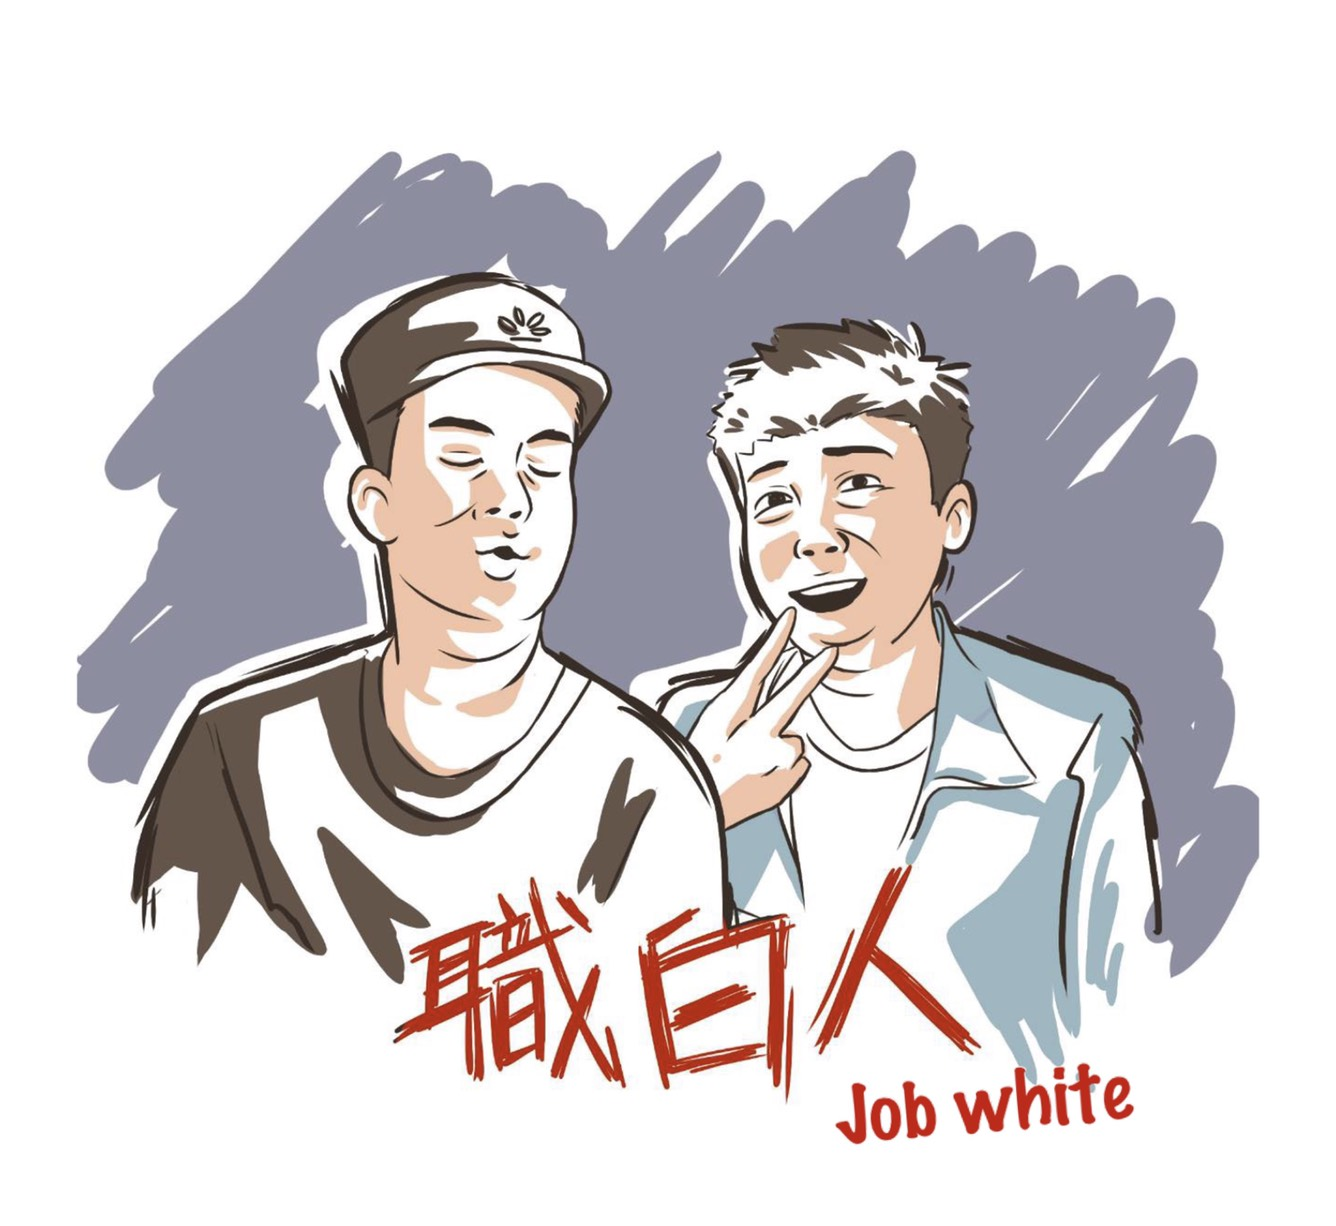 EP4   OMG!!淺規則真恐怖,模特兒的獨家大爆料  Ft.小誌【Job white 職白人】